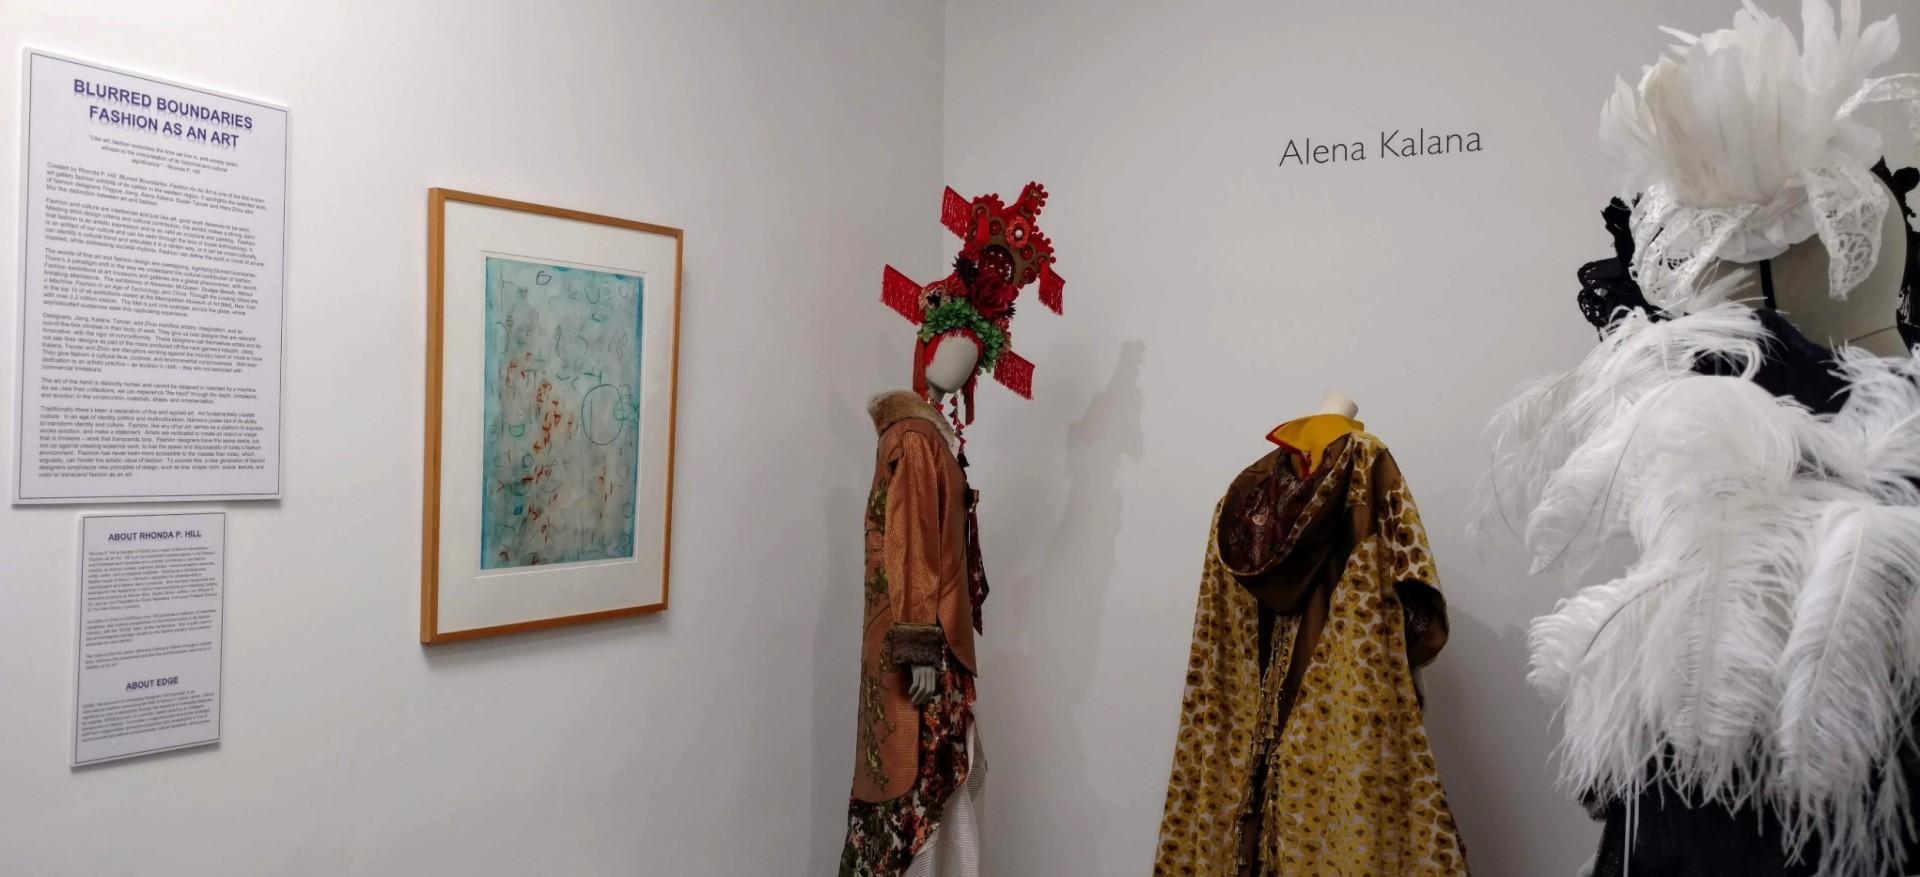 curated by Rhonda P. Hill, Blurred Boundaries Fashion as an Art exhibit, GraySpace Gallery, Santa Barbara, ©EDGExpo.com